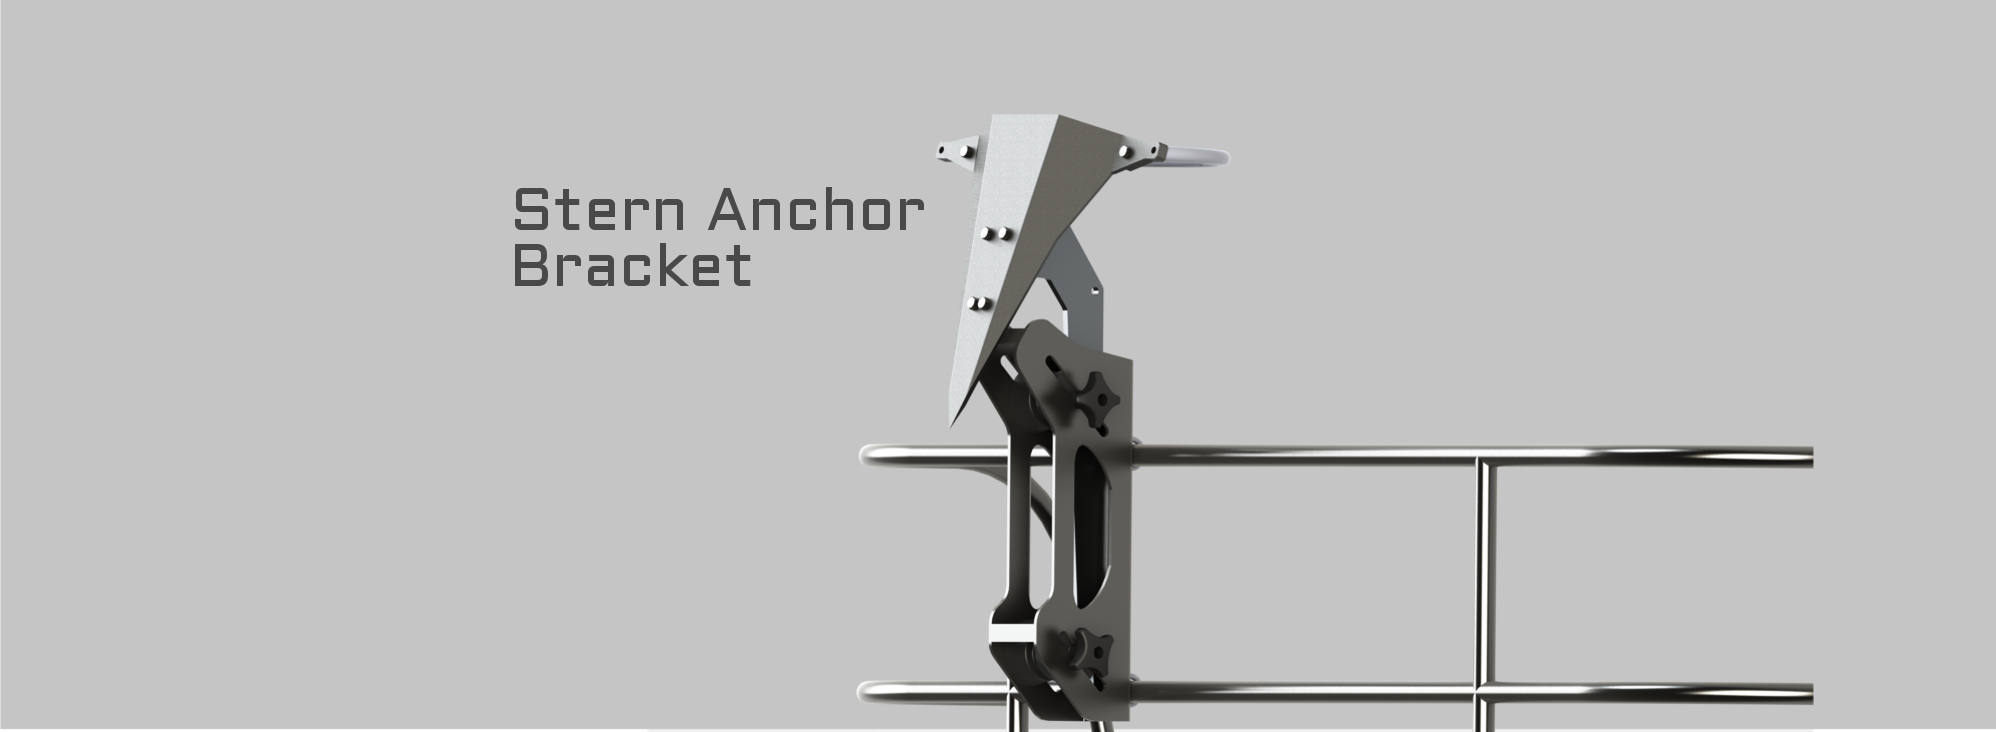 SLIDER IMAGE ONE SIDE VIEW ANCHOR BRACKET